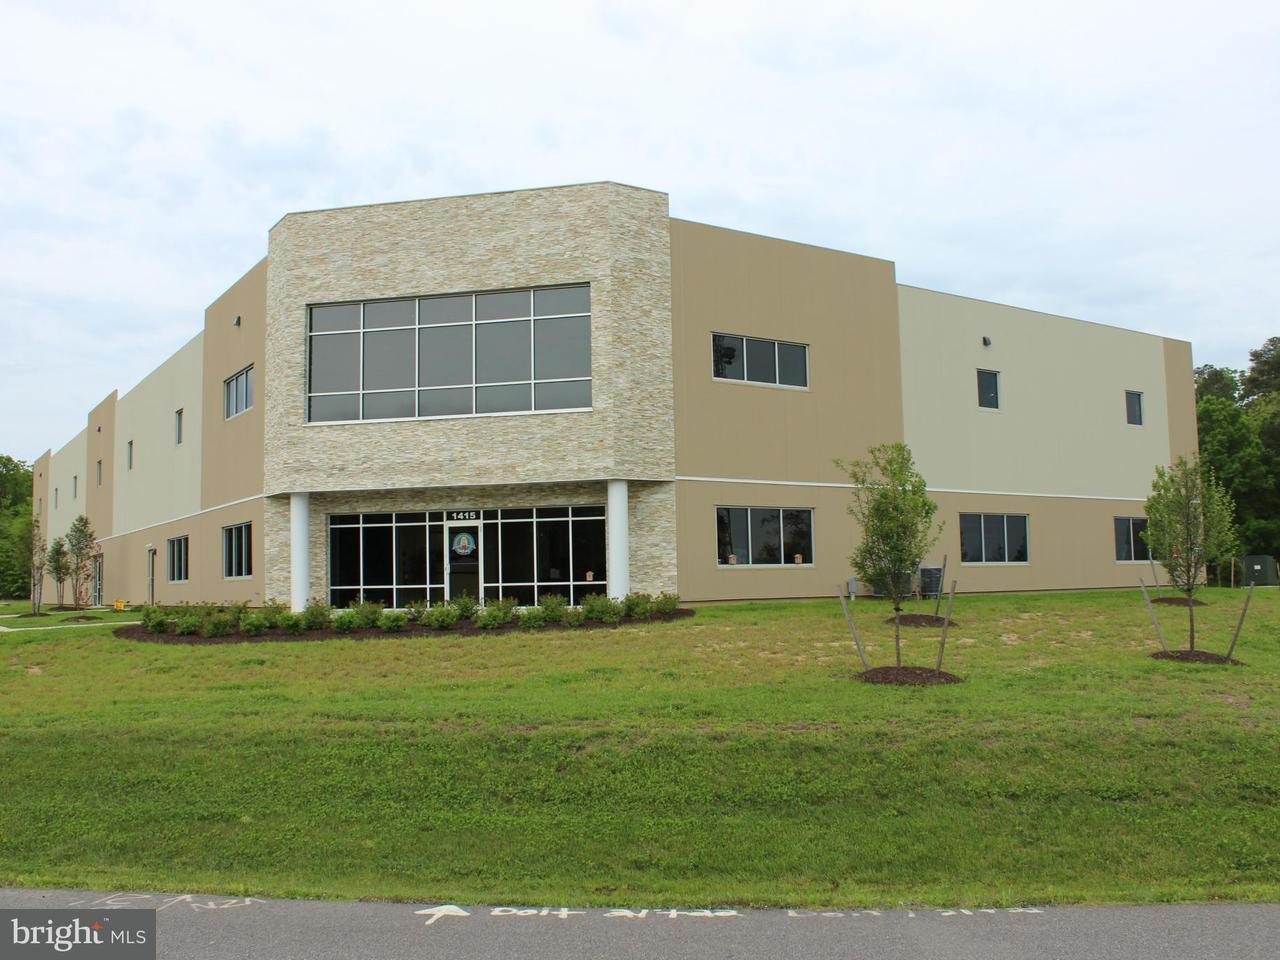 Other Residential for Rent at 1415 Sonny Schulz Blvd Stevensville, Maryland 21666 United States